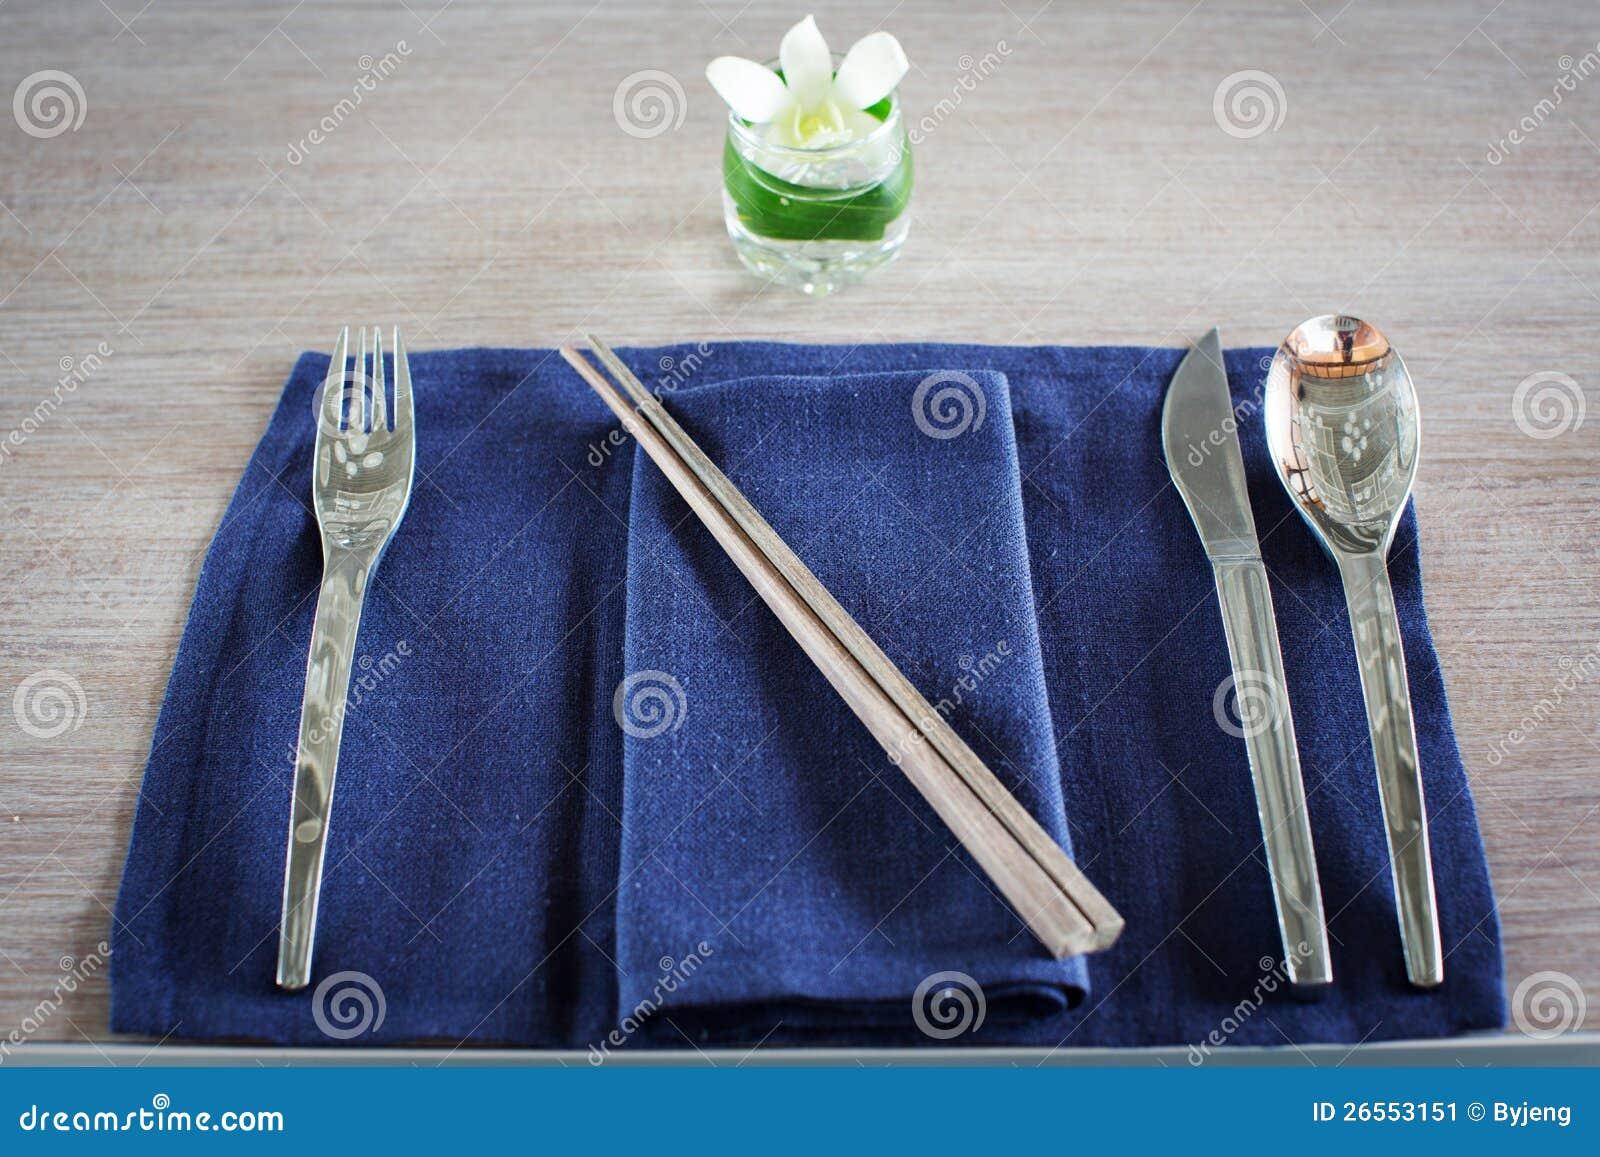 Fork Spoon Knife And Chopsticks Stock Image Image  : fork spoon knife chopsticks 26553151 from dreamstime.com size 1300 x 957 jpeg 184kB